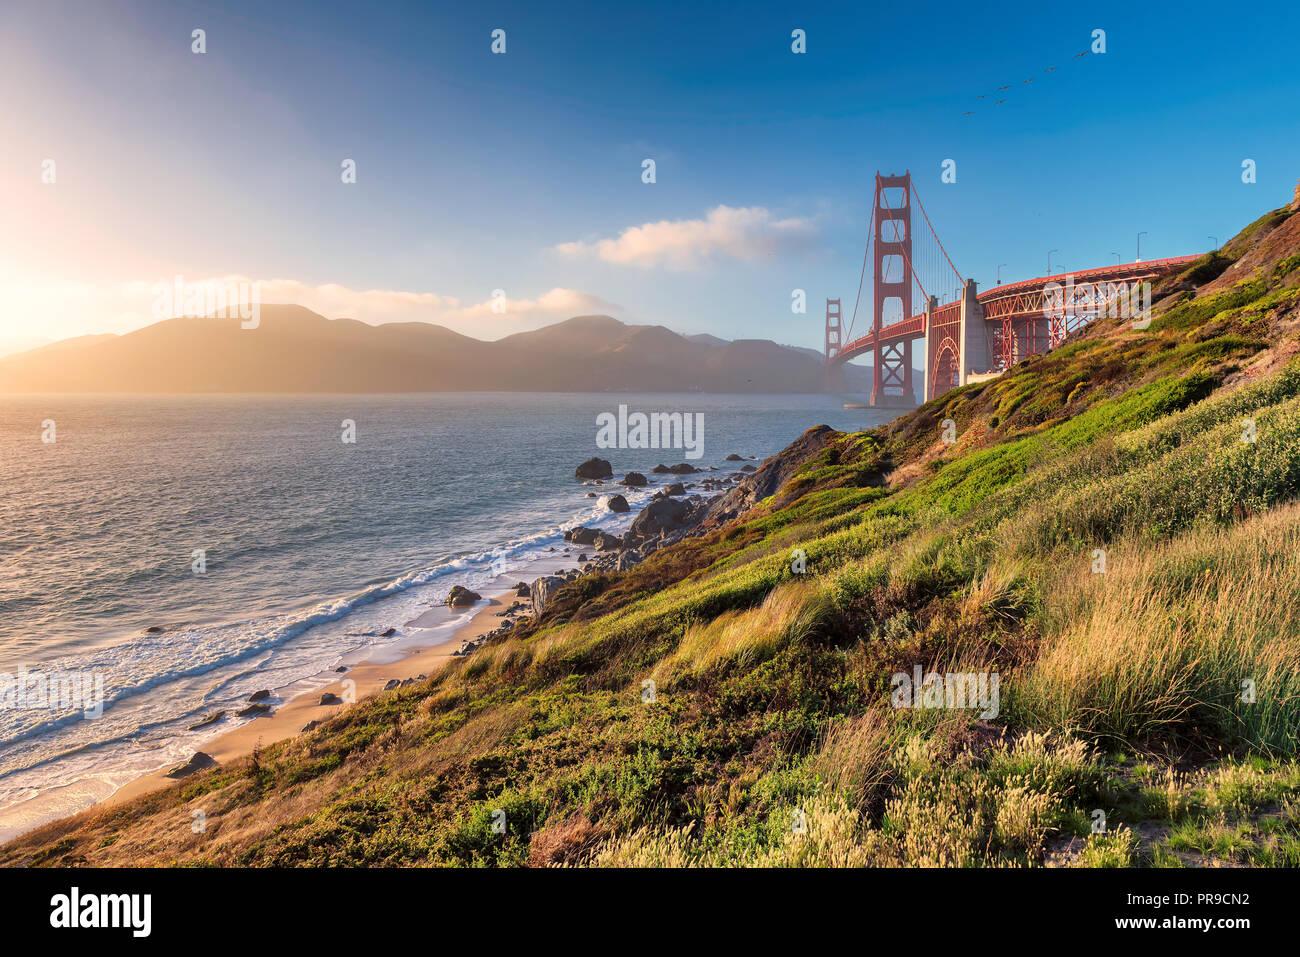 California coast - Golden Gate Bridge au coucher du soleil à San Francisco Photo Stock